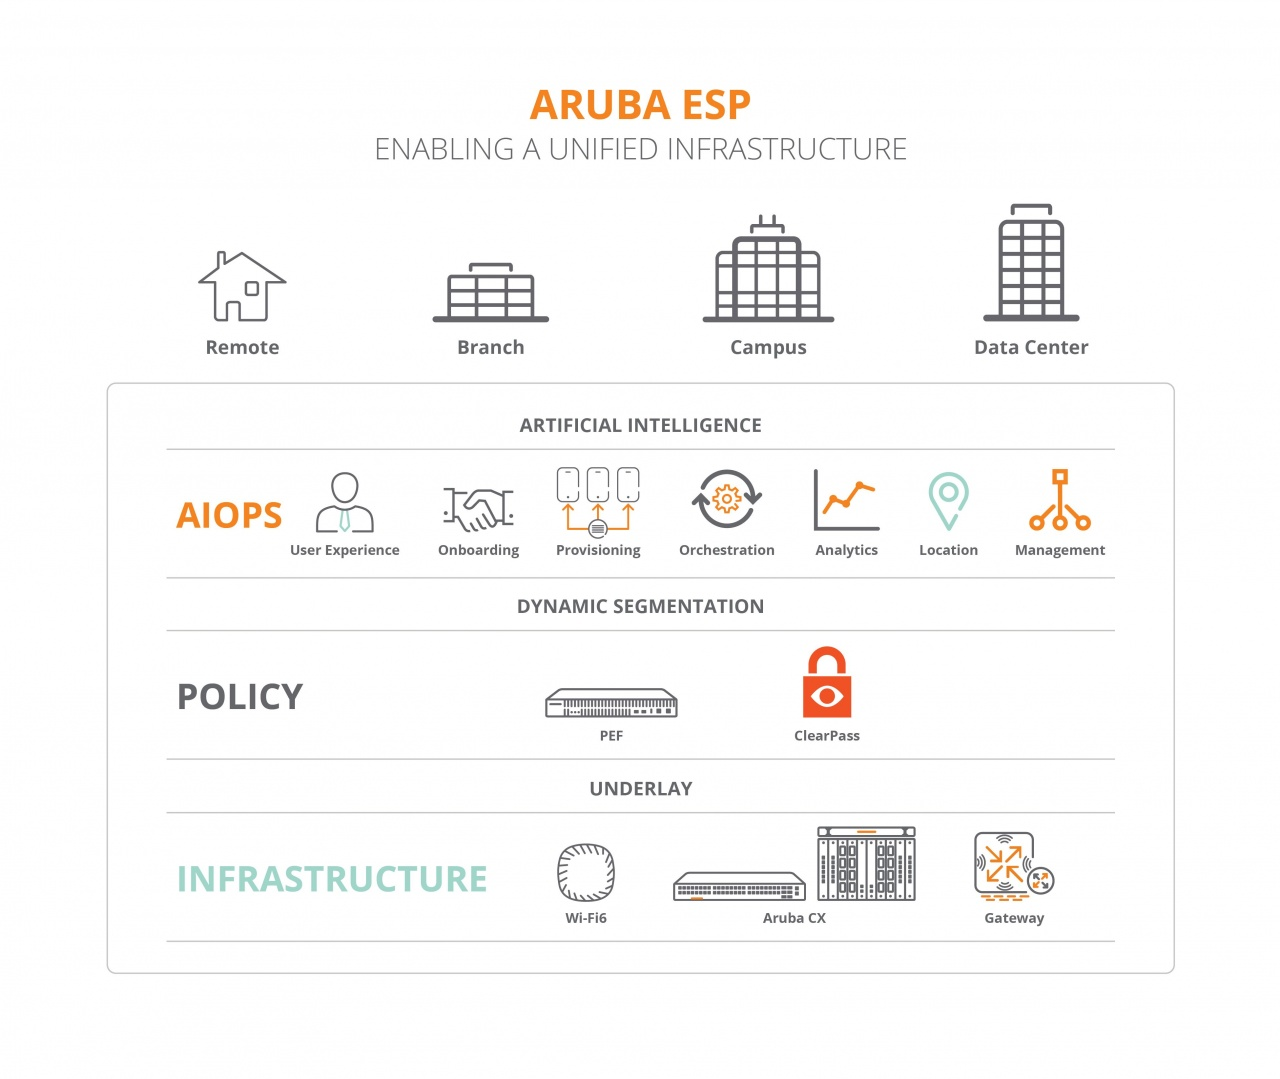 aruba esp enabling a unified infrastructure (1)